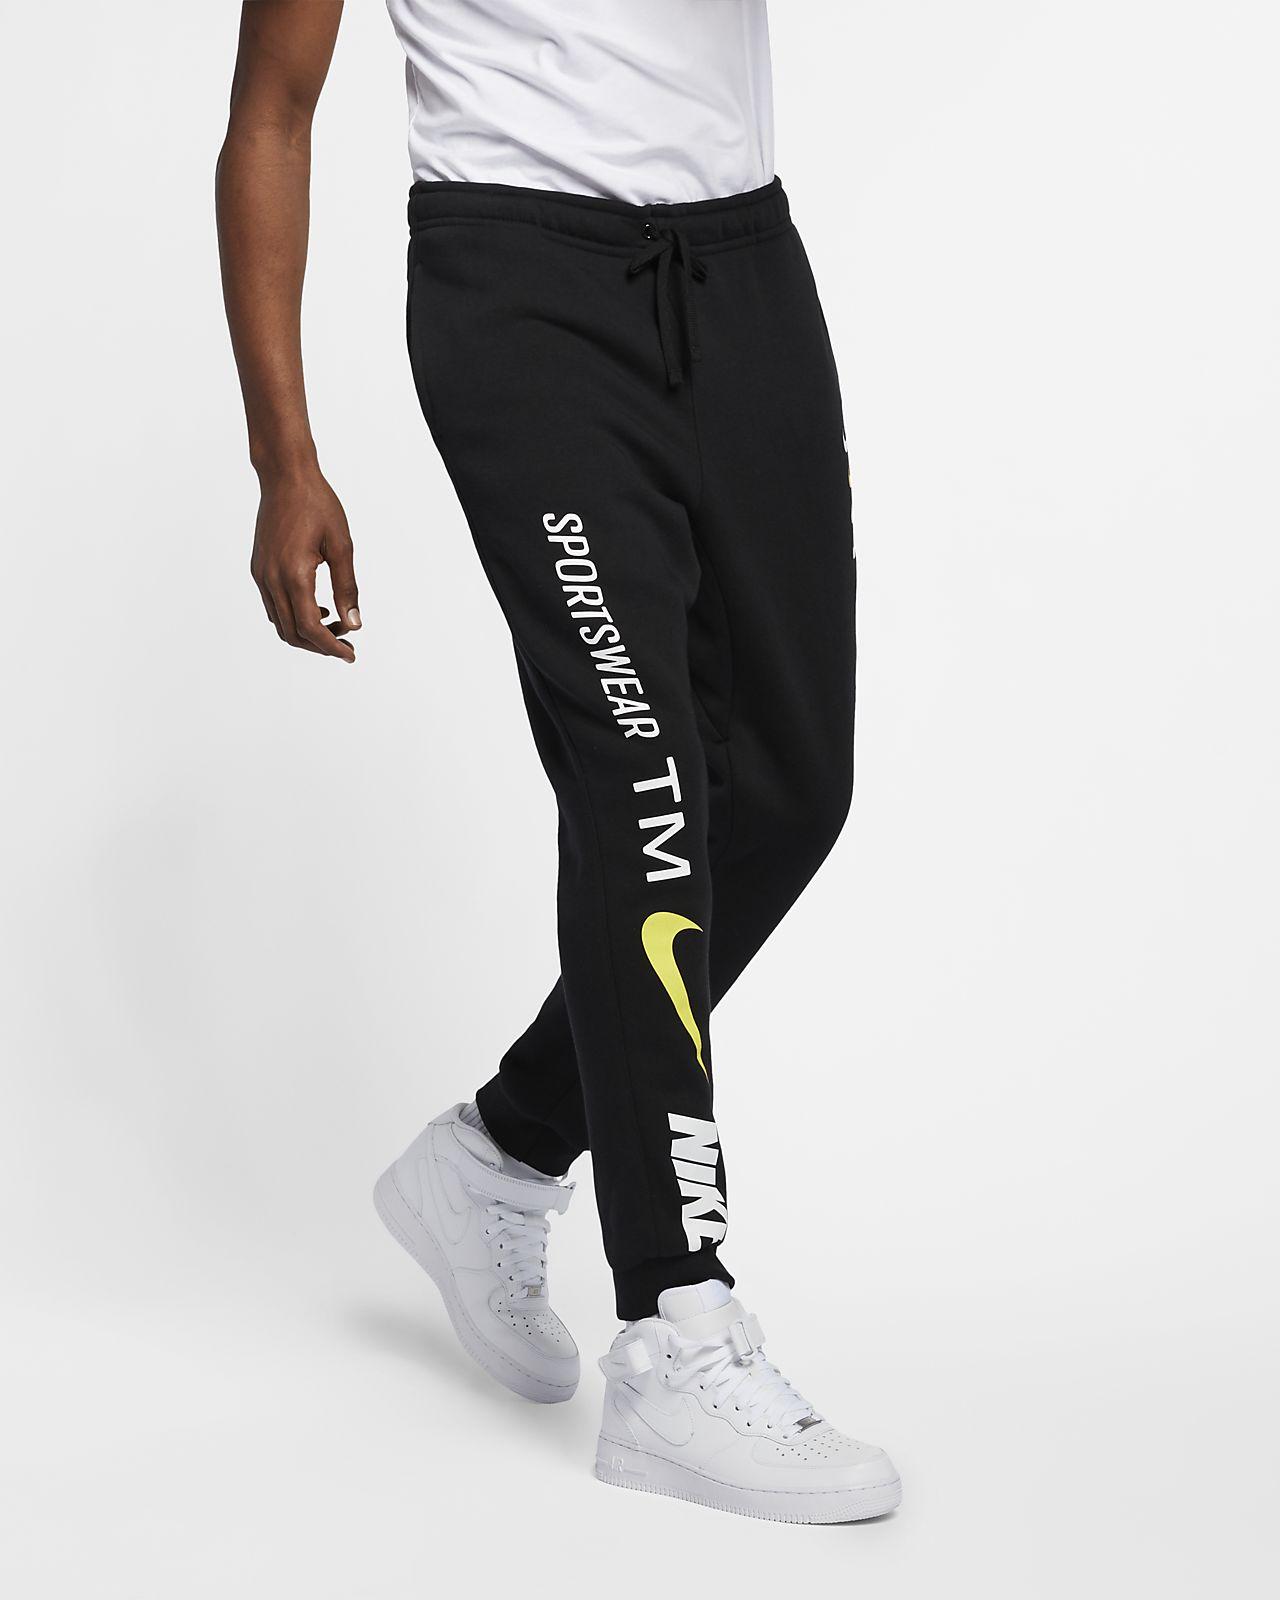 e71315be6368f6 Low Resolution Nike Sportswear Club Jogginghose Nike Sportswear Club  Jogginghose